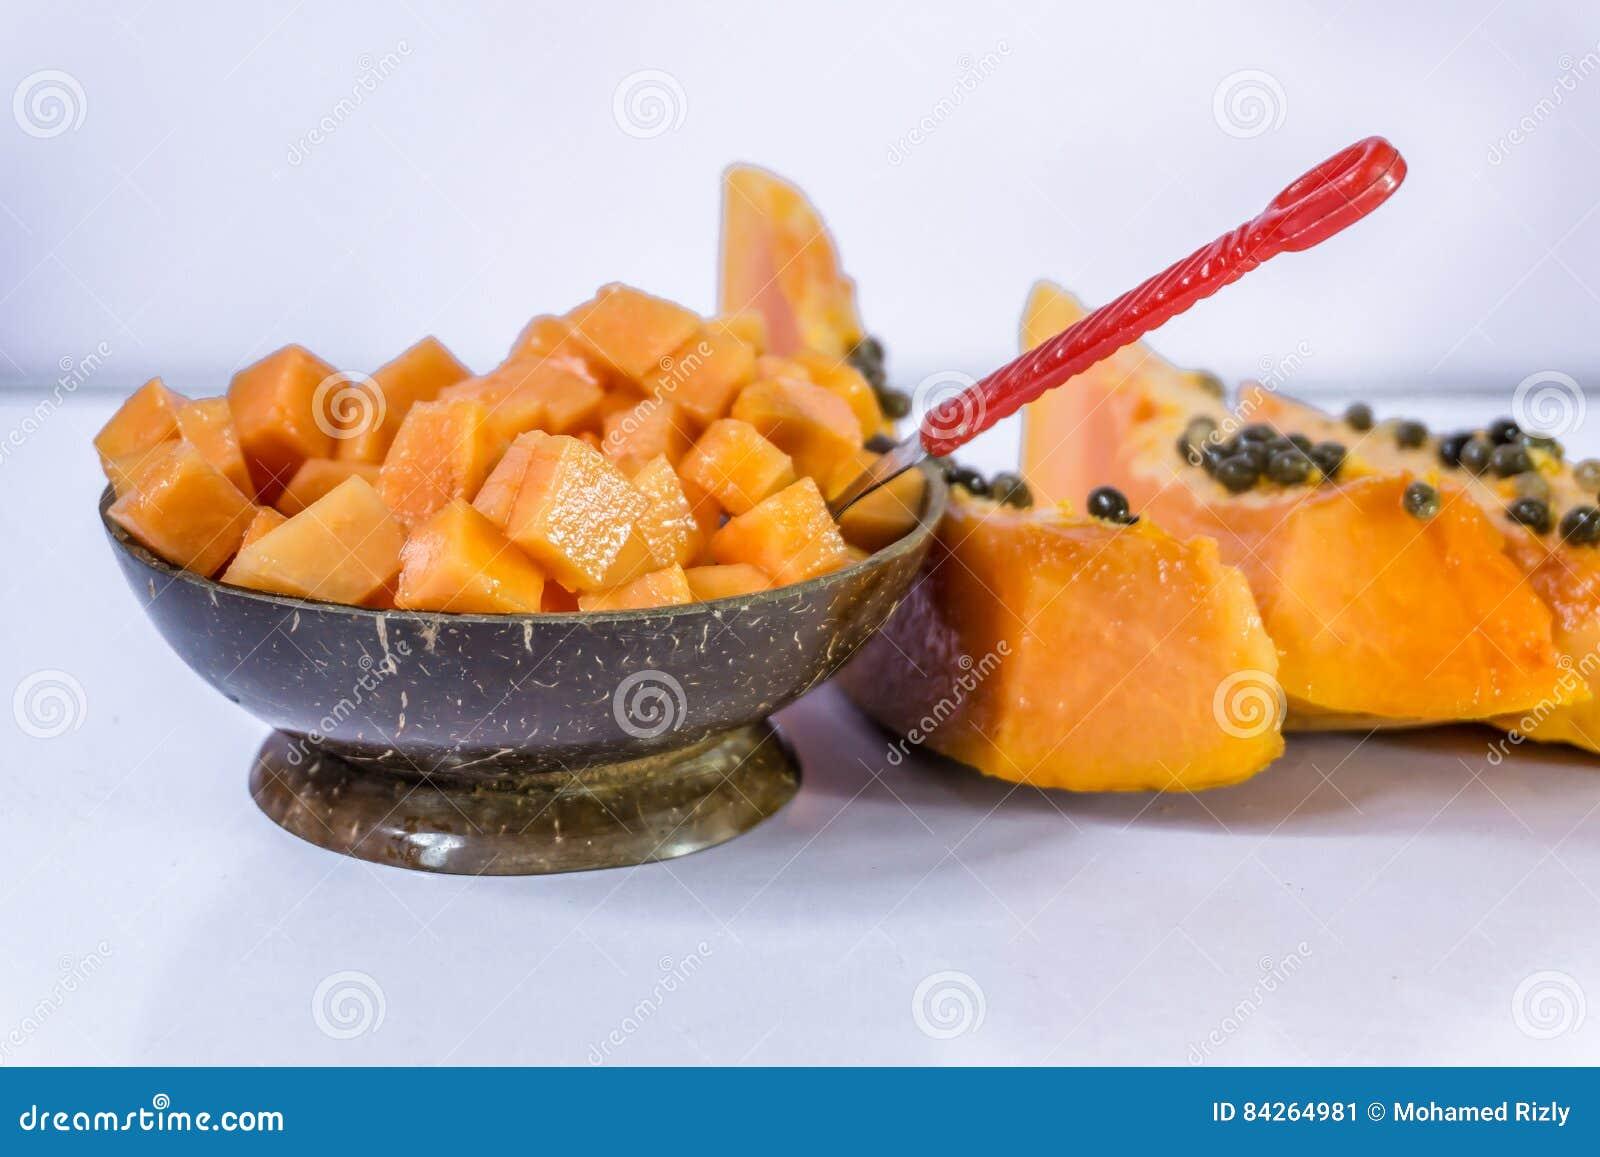 Slice of papaya isolated on the white table